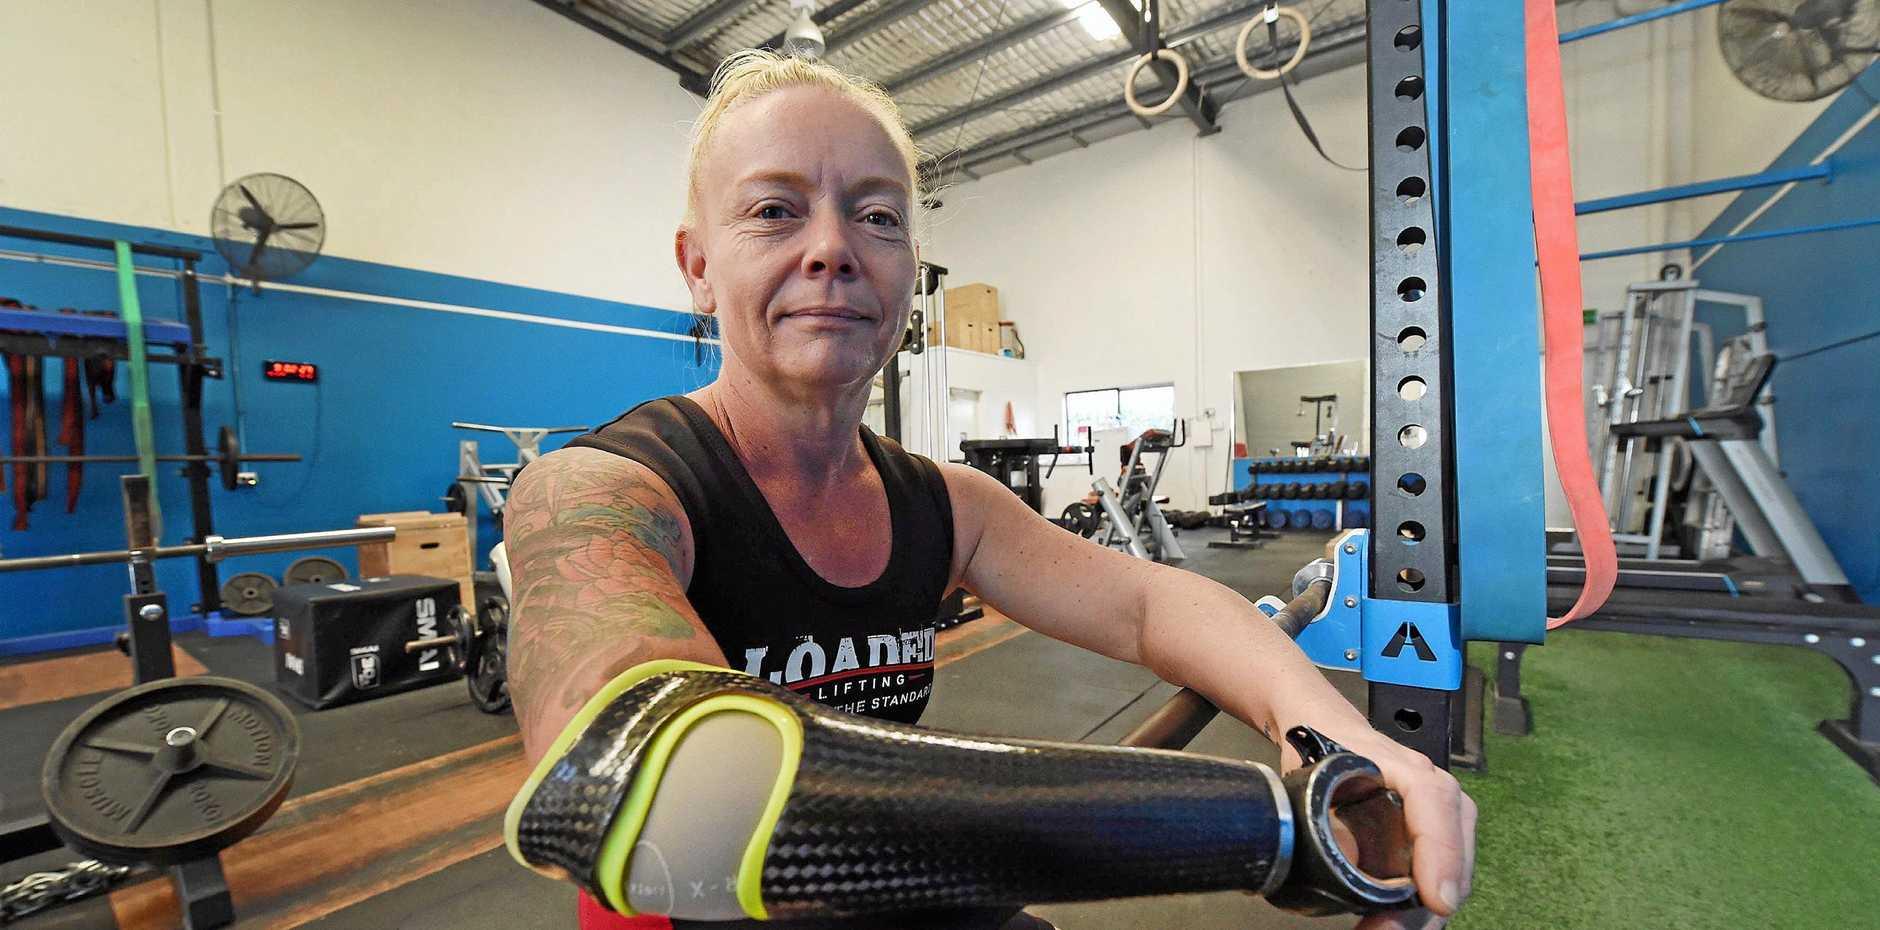 Singular focus lifts Hervey Bay mum to new world records